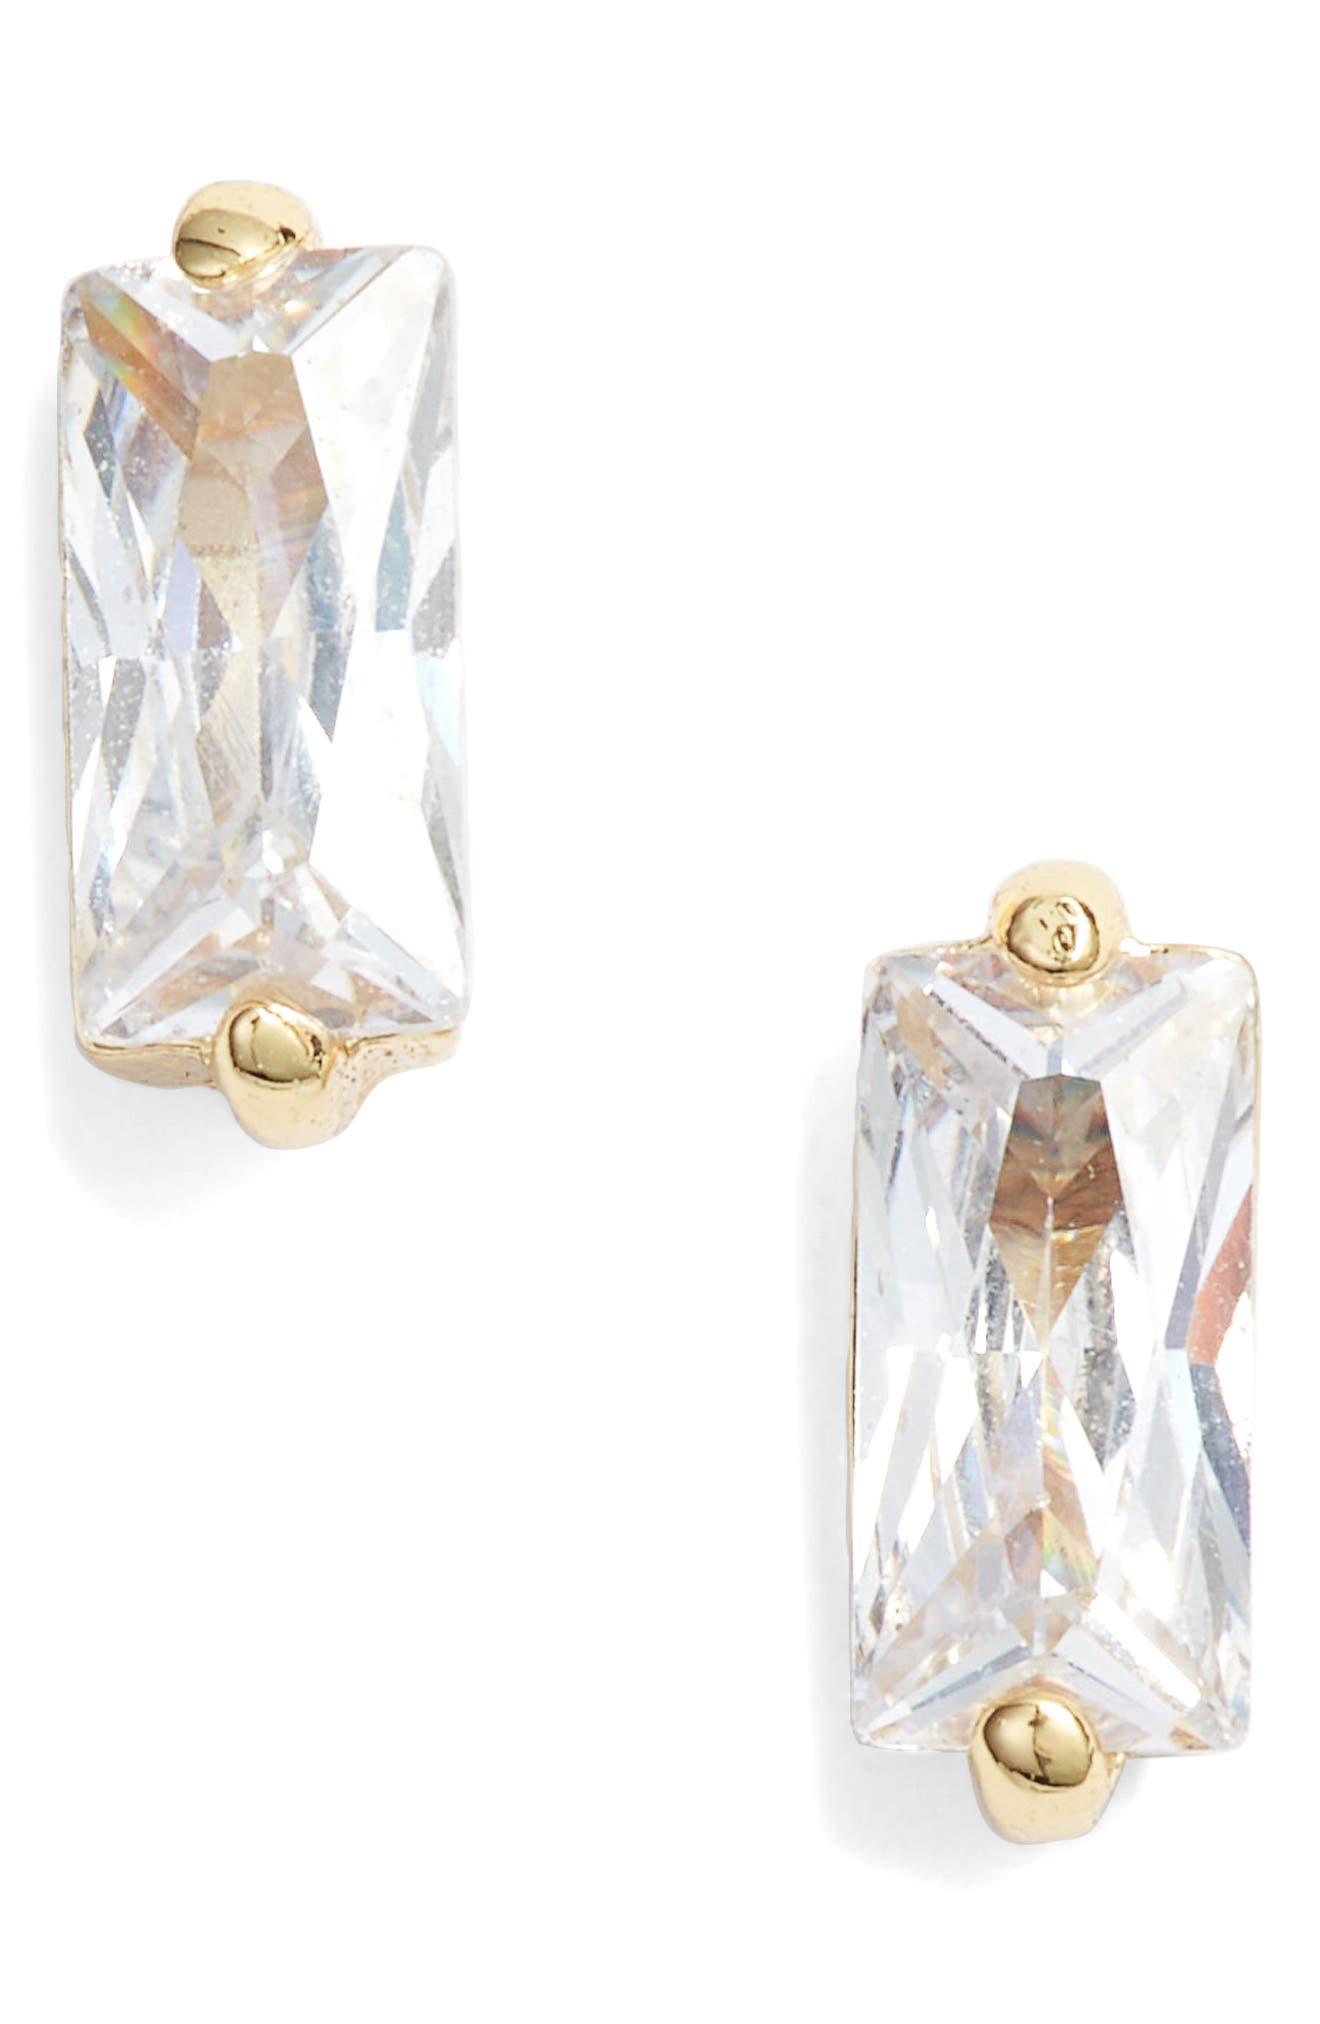 Amara Stud Earrings,                             Main thumbnail 1, color,                             GOLD